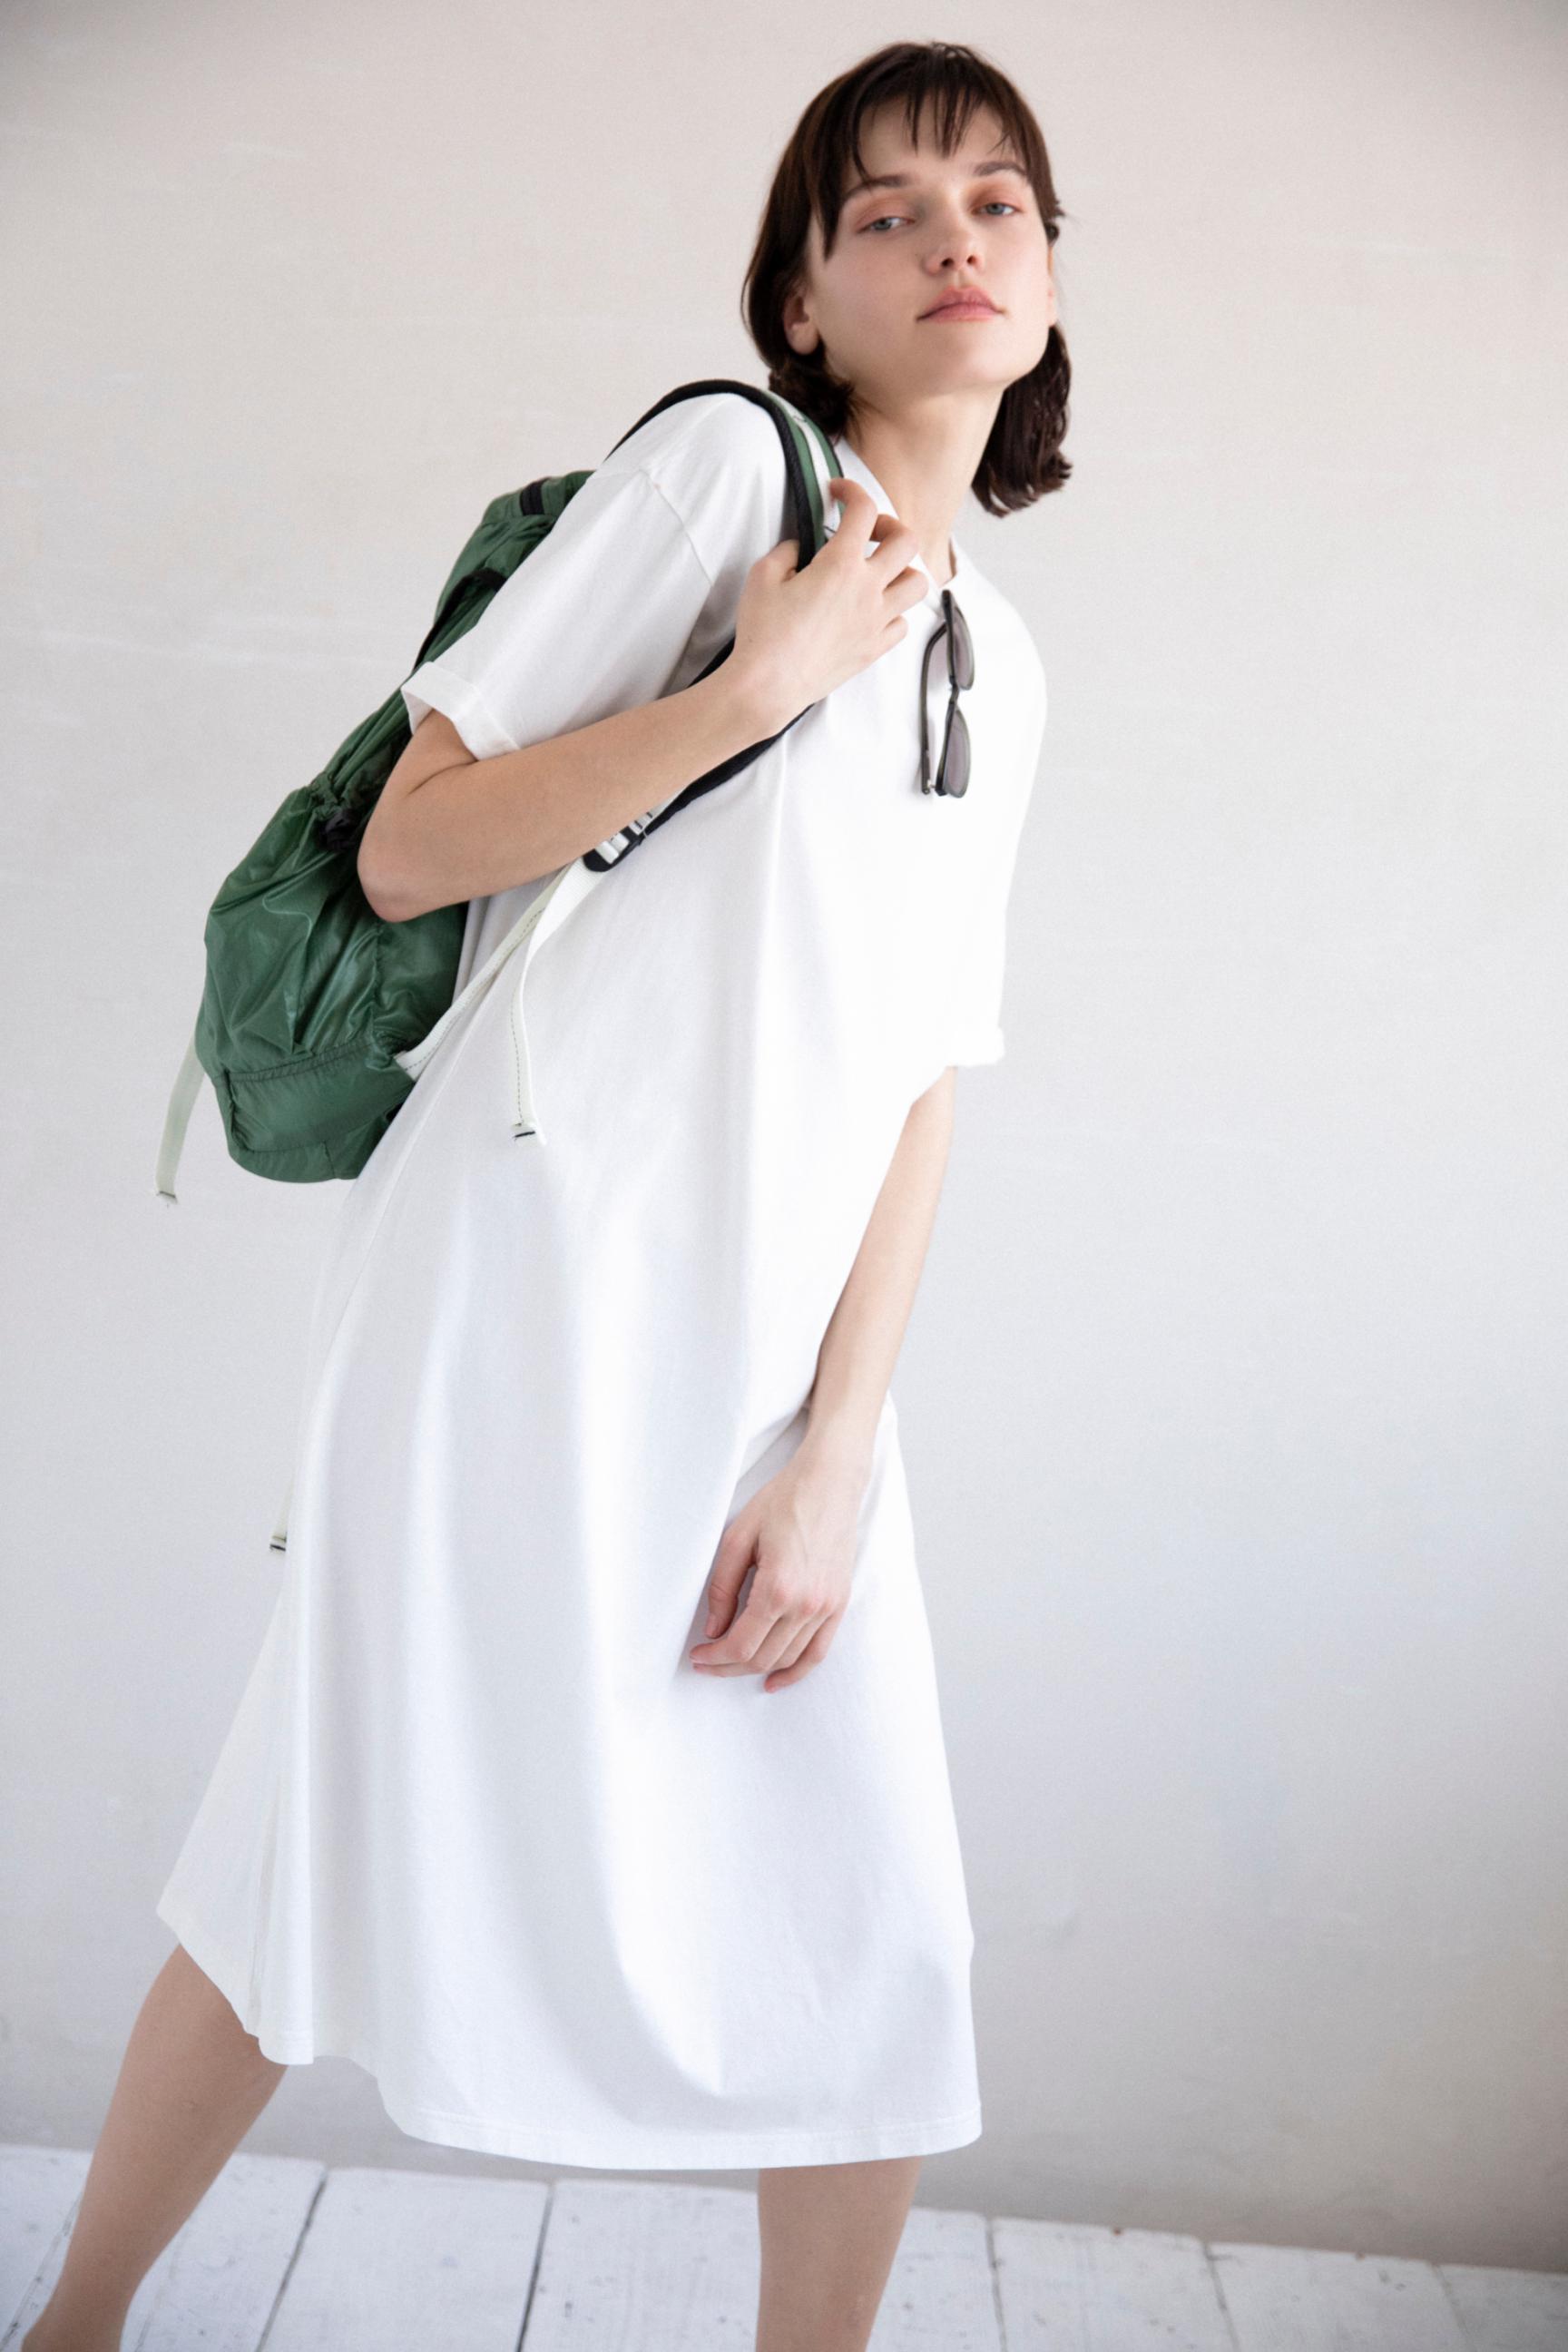 42_1 dress¥23,100 hair acc¥7,700 sunglasses¥20,900 bag¥19,250 shoes¥7,150